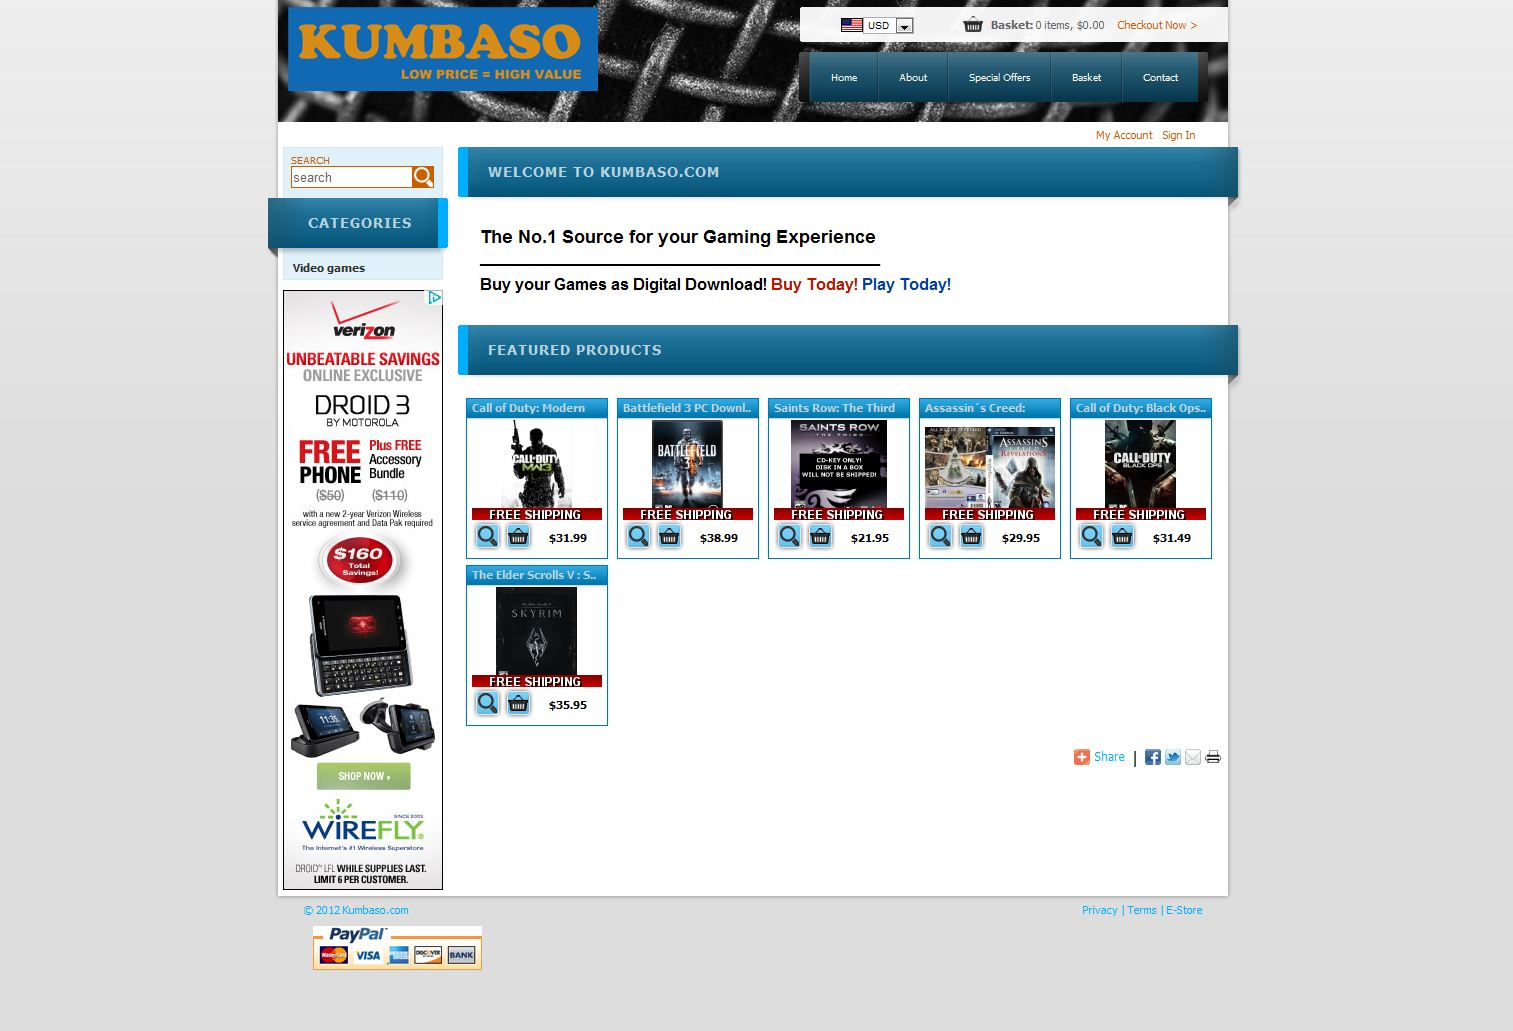 Kumbaso.com